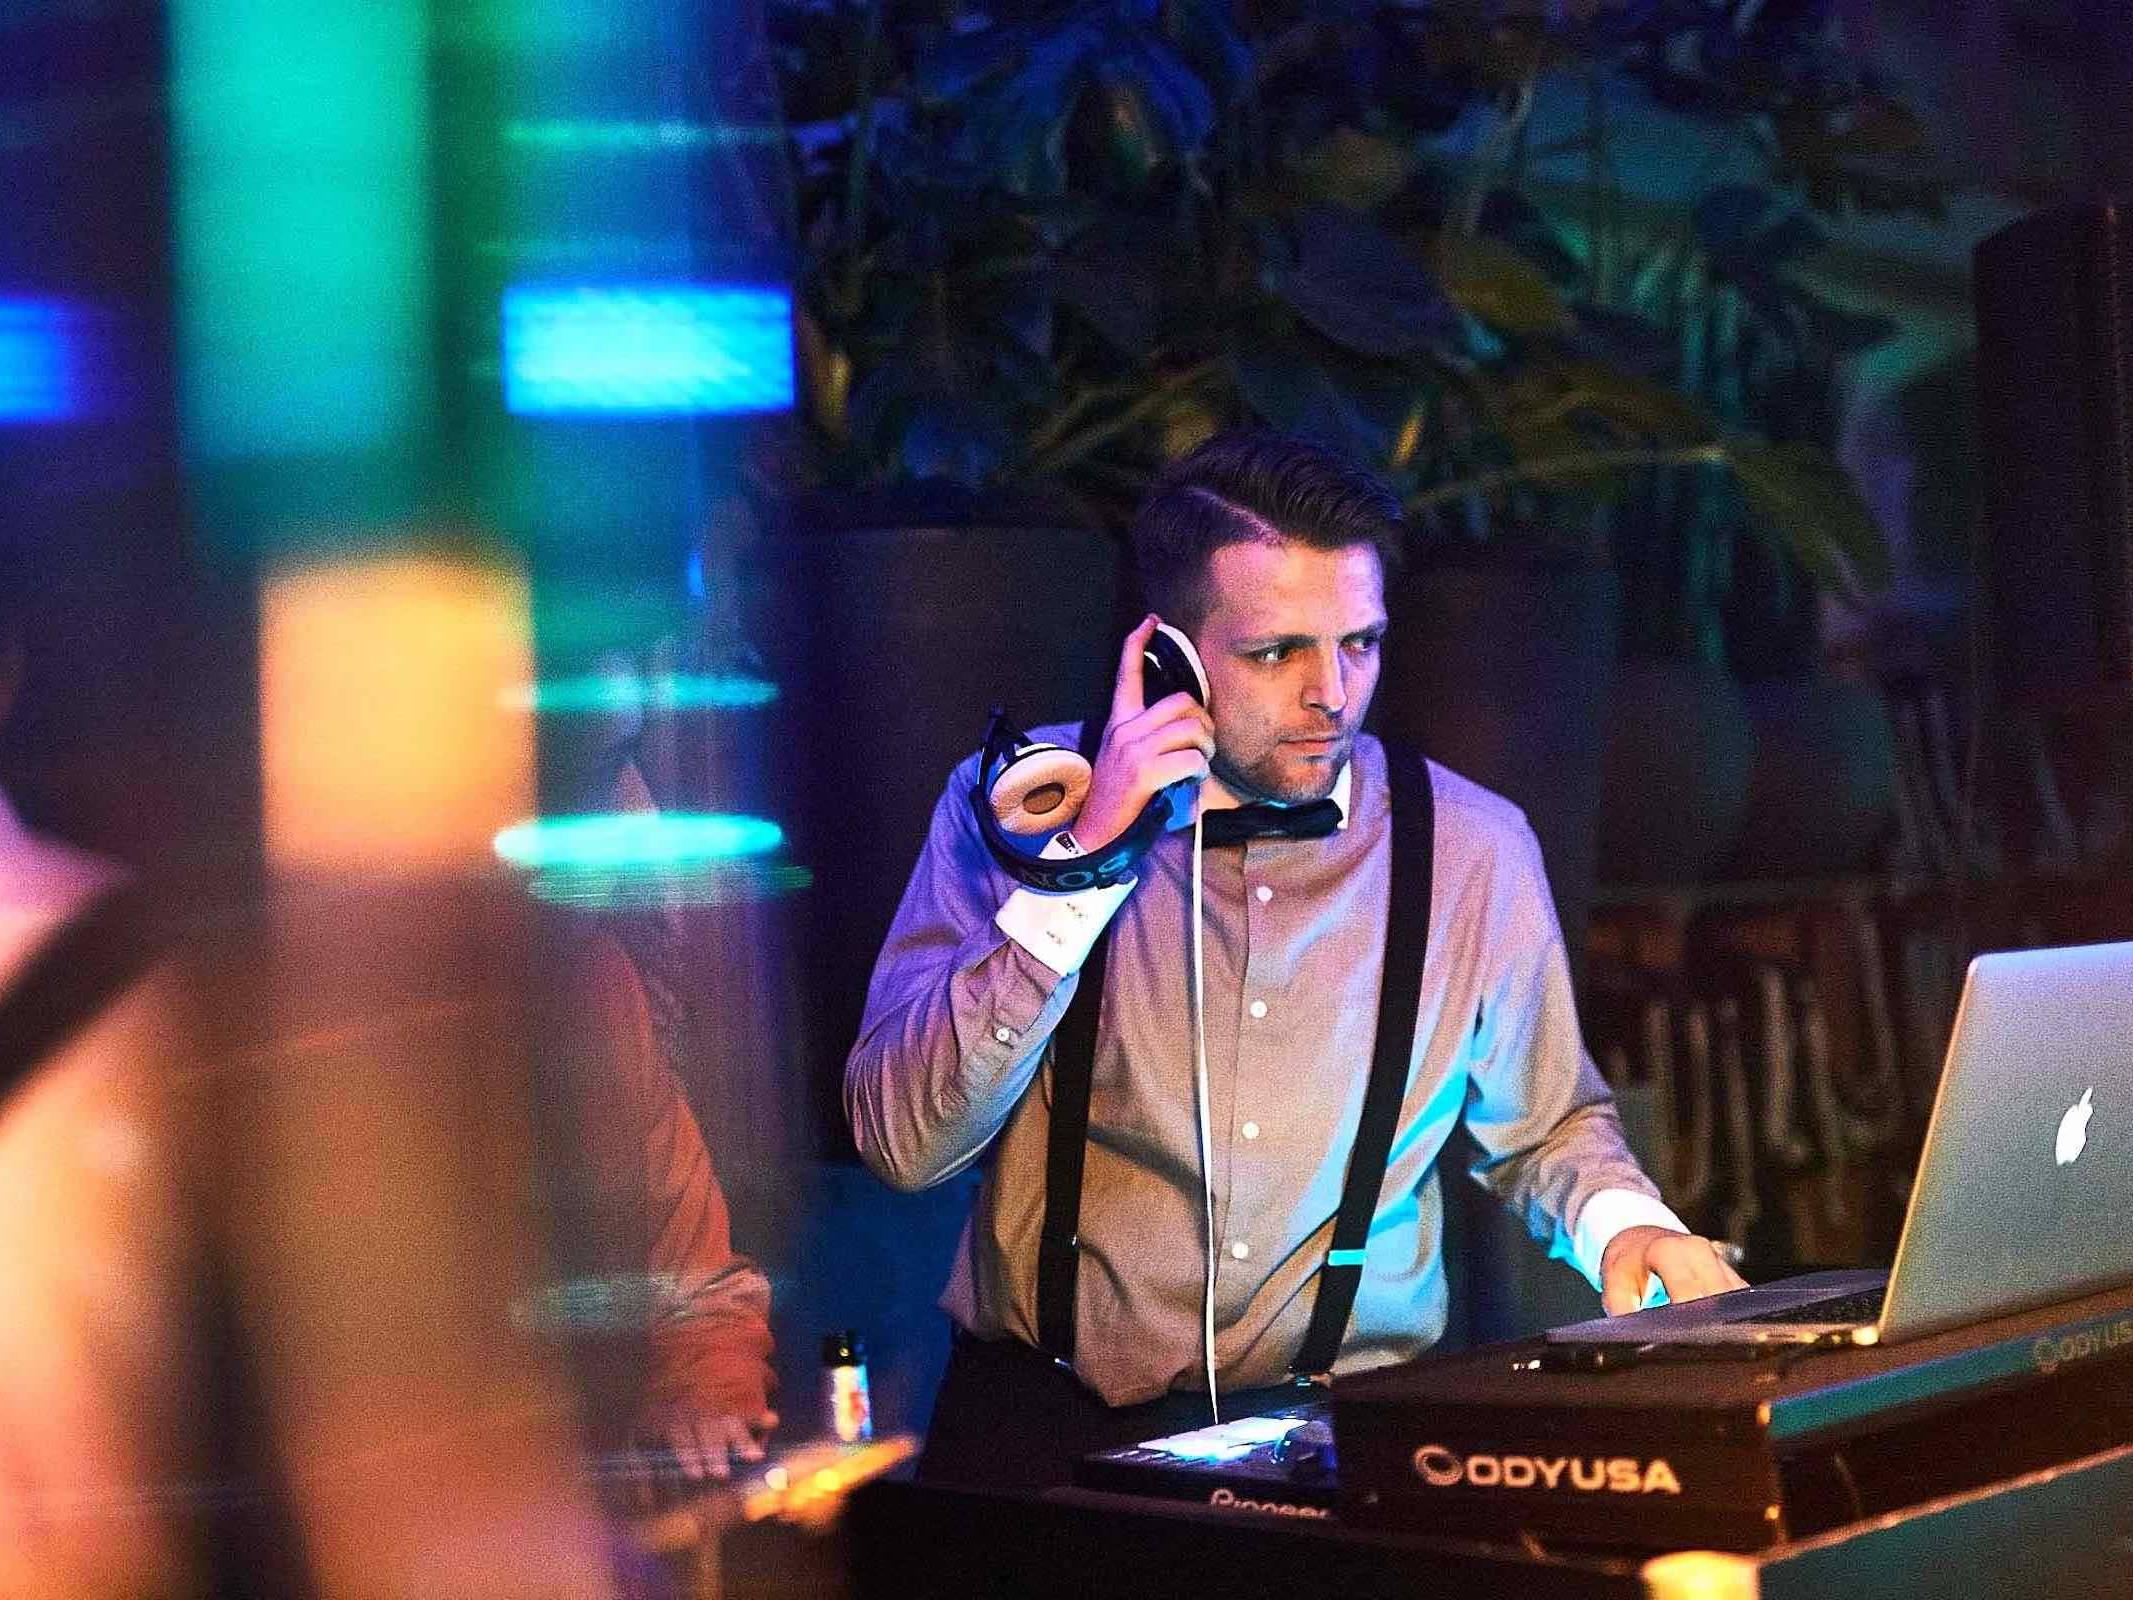 DJ   Hamburg   Buchen   Discjockey   Messe   DJ   Bremen   DJ   Event   DJ   Geburtstag   DJ   Mieten   Anfragen   DJ   Kosten   DJ   Agentur   DJ   Timm   Hamburgfeiert